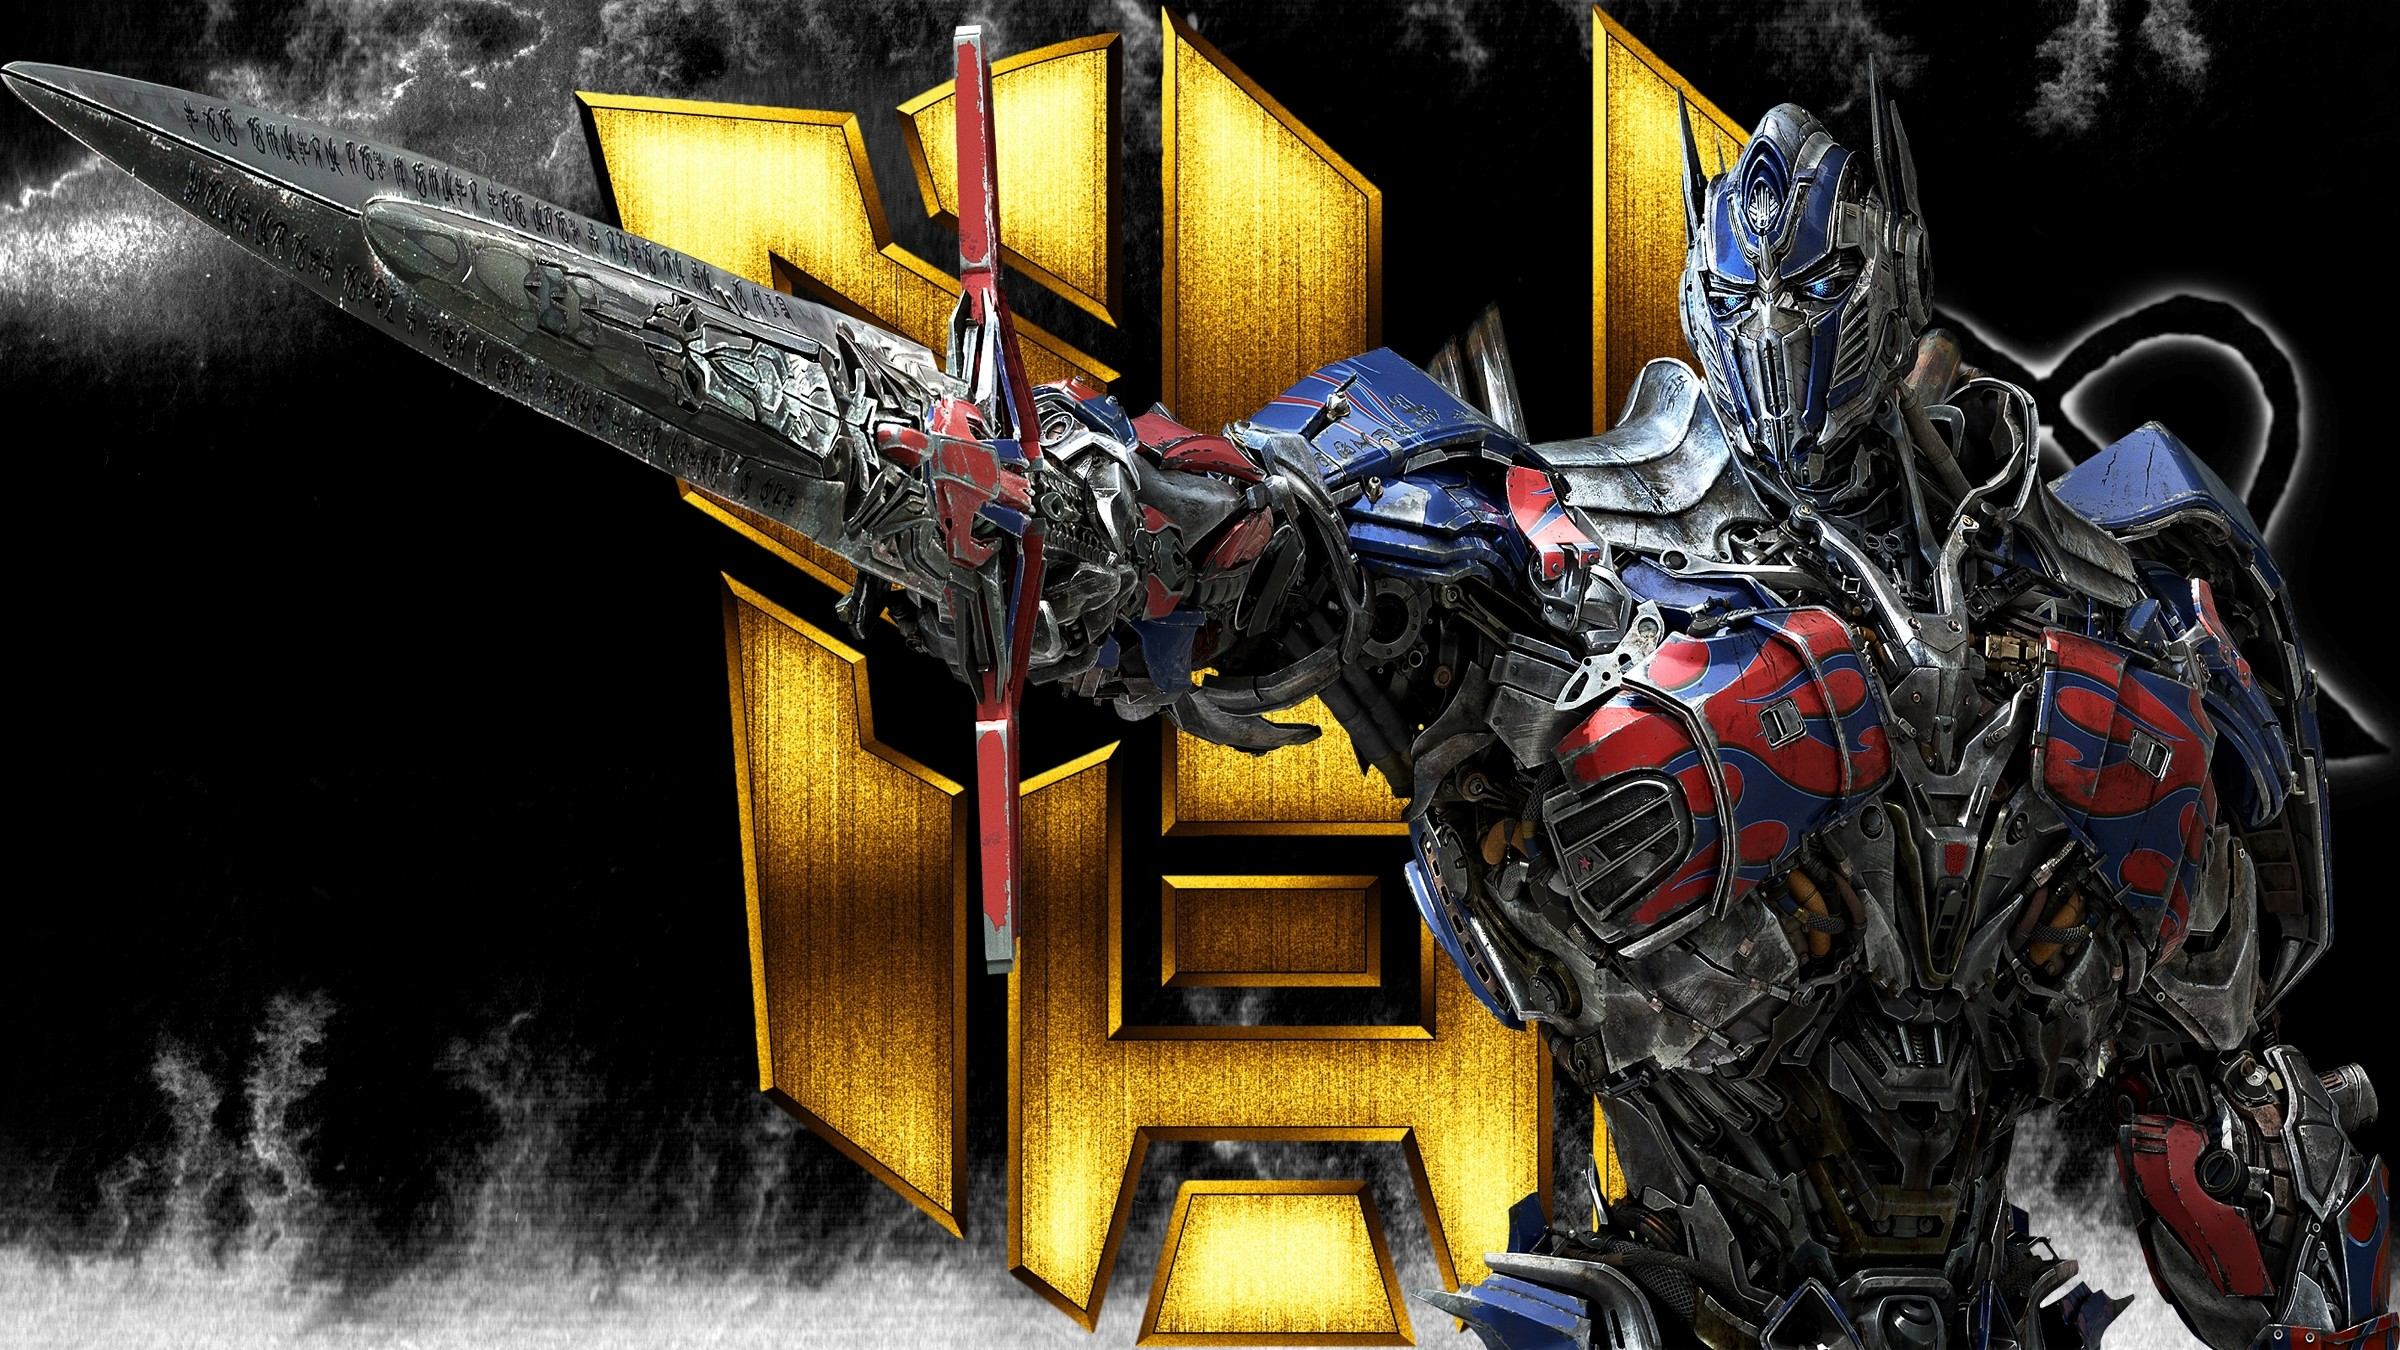 Optimus Prime Wallpapers Free Download